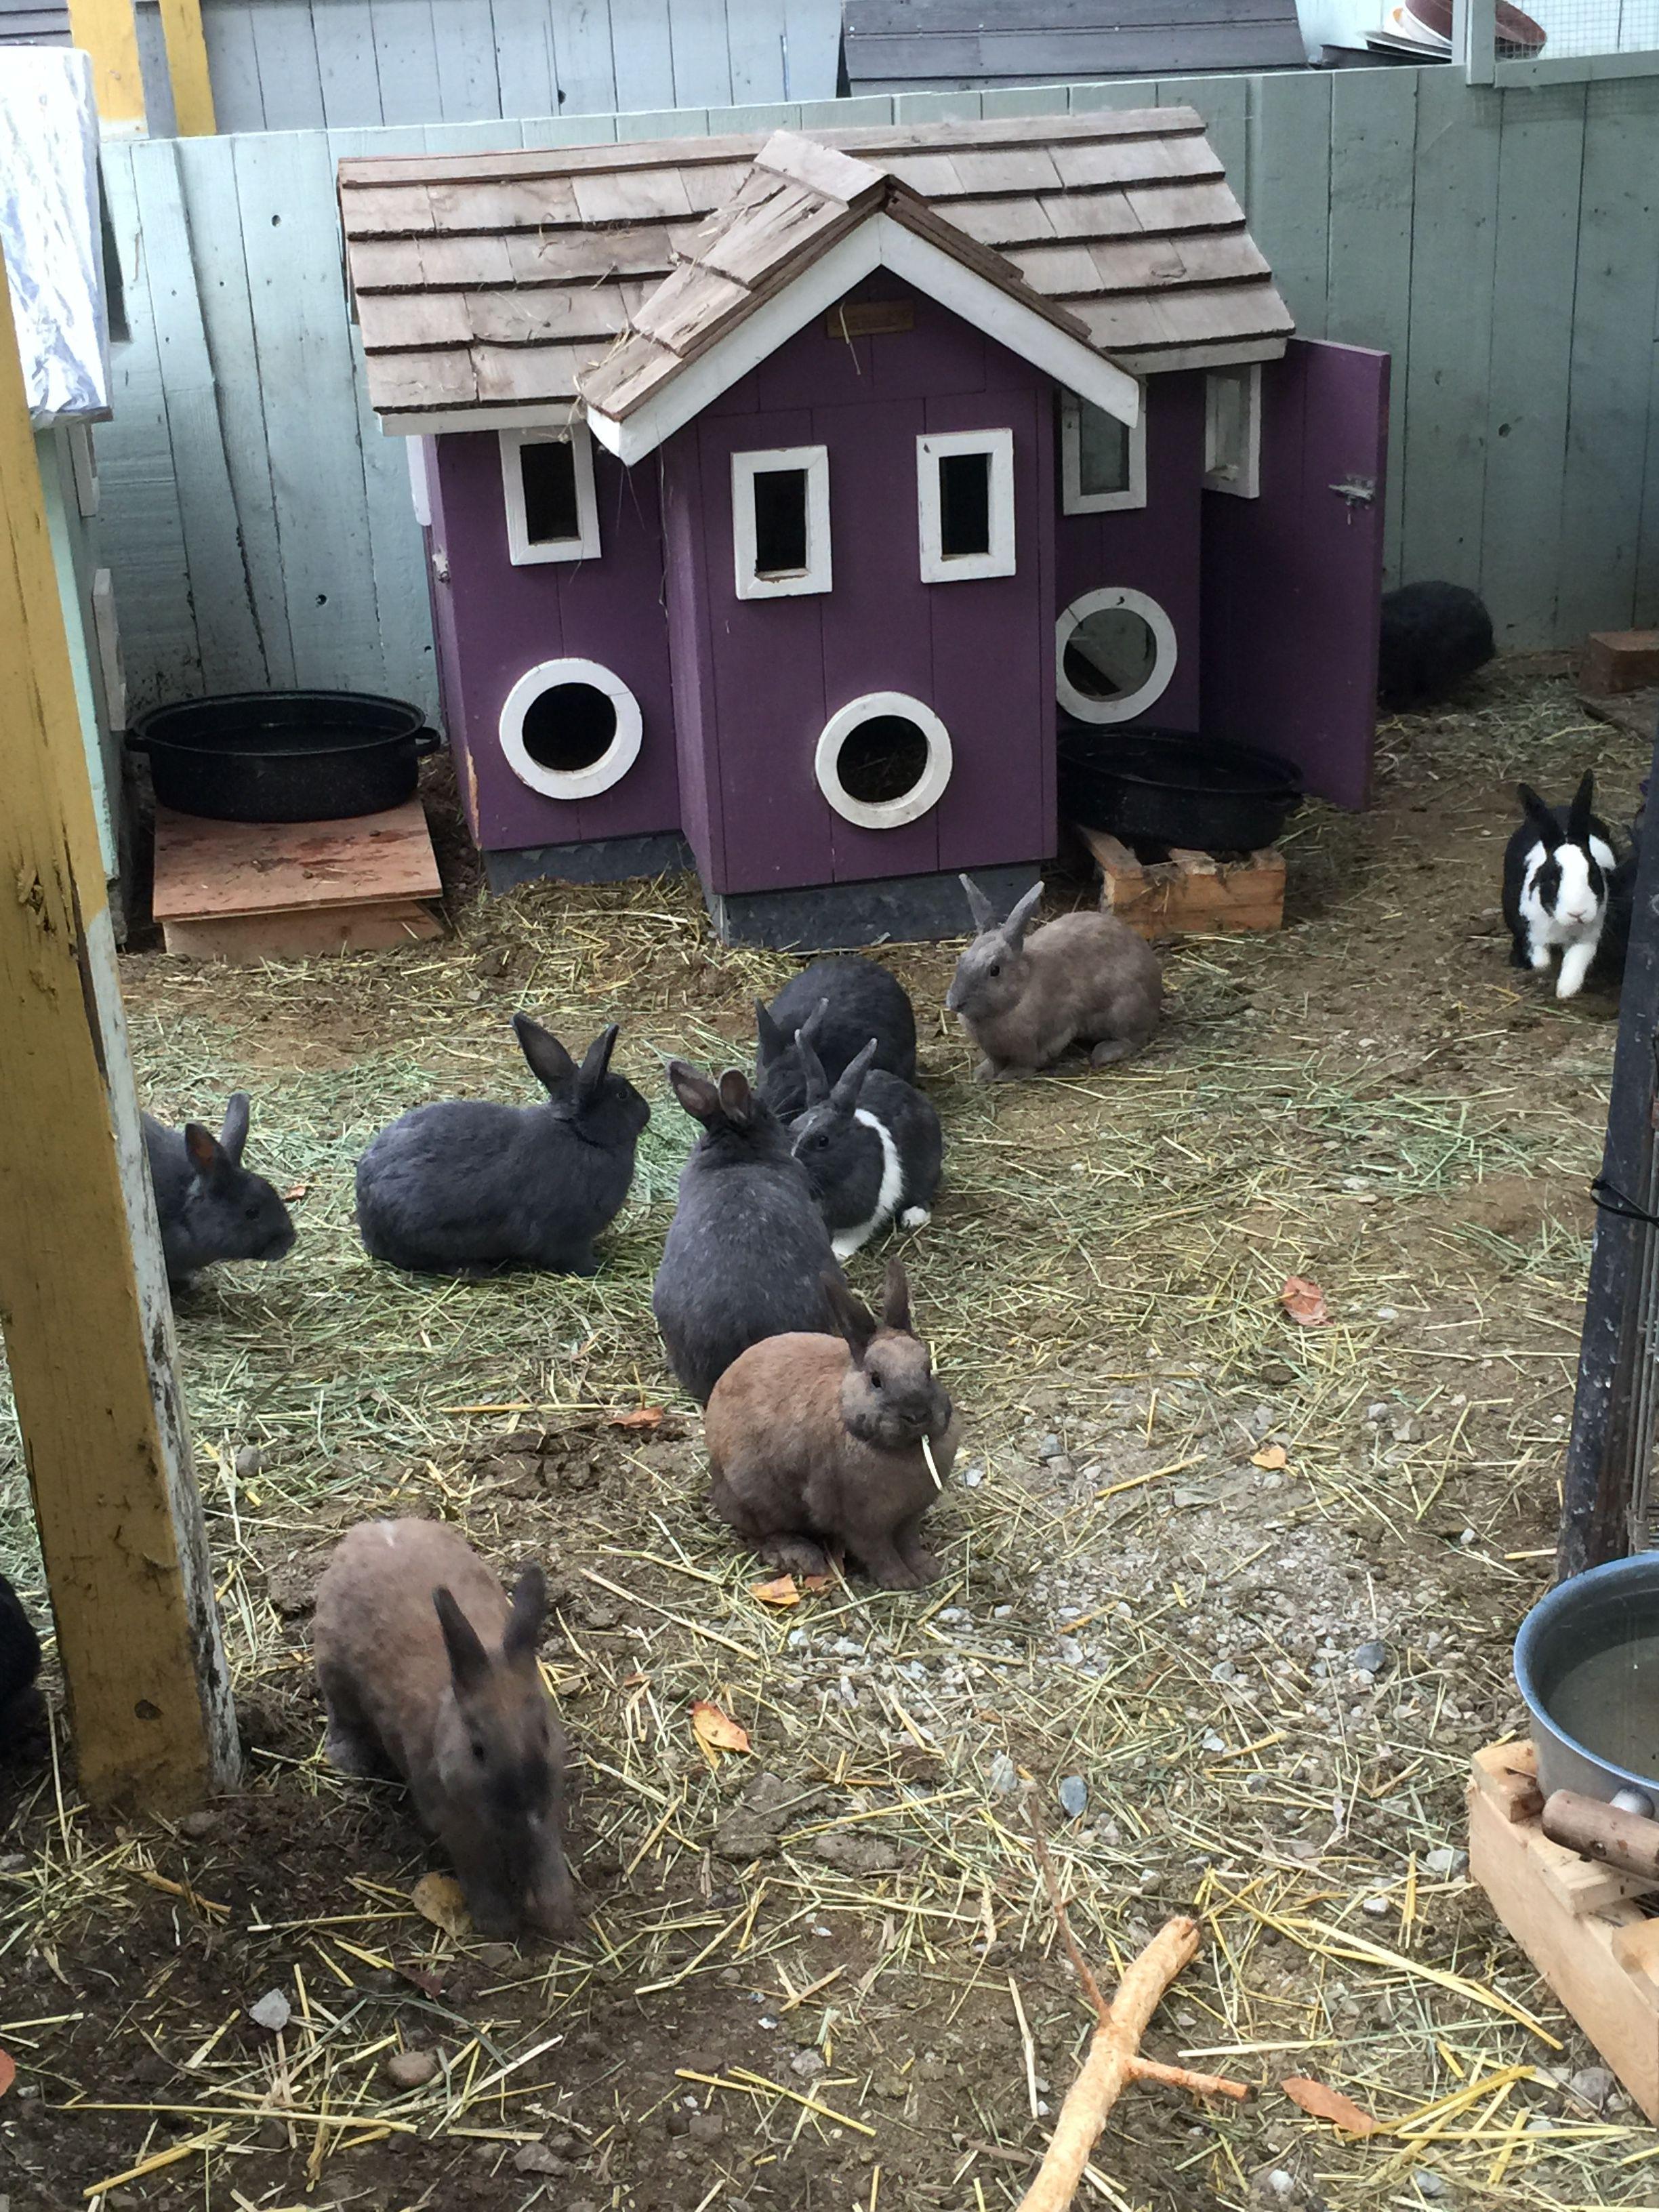 Colony Style Rabbit Sanctuary Rabbitats Rabbit Rescue Surrey Bc Up To 50 Spayed Neutered Rabbits Cohabit A Spa Pet Area Animal Sanctuary Animal Rescue Ideas